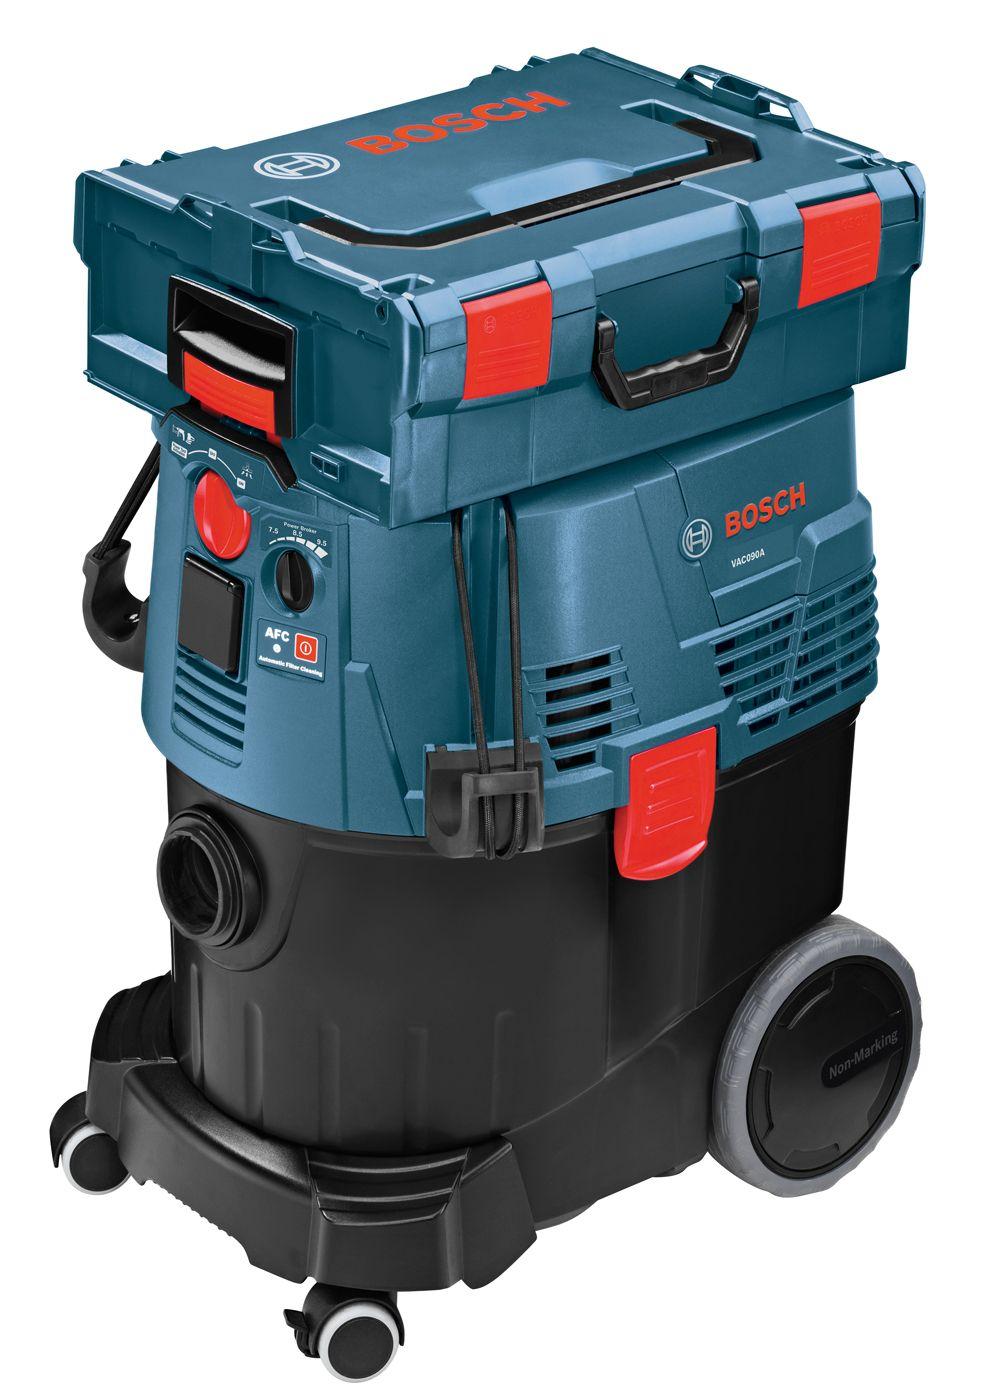 New Bosch Dust Extractors Bosch Tools Bosch Woodworking Power Tools